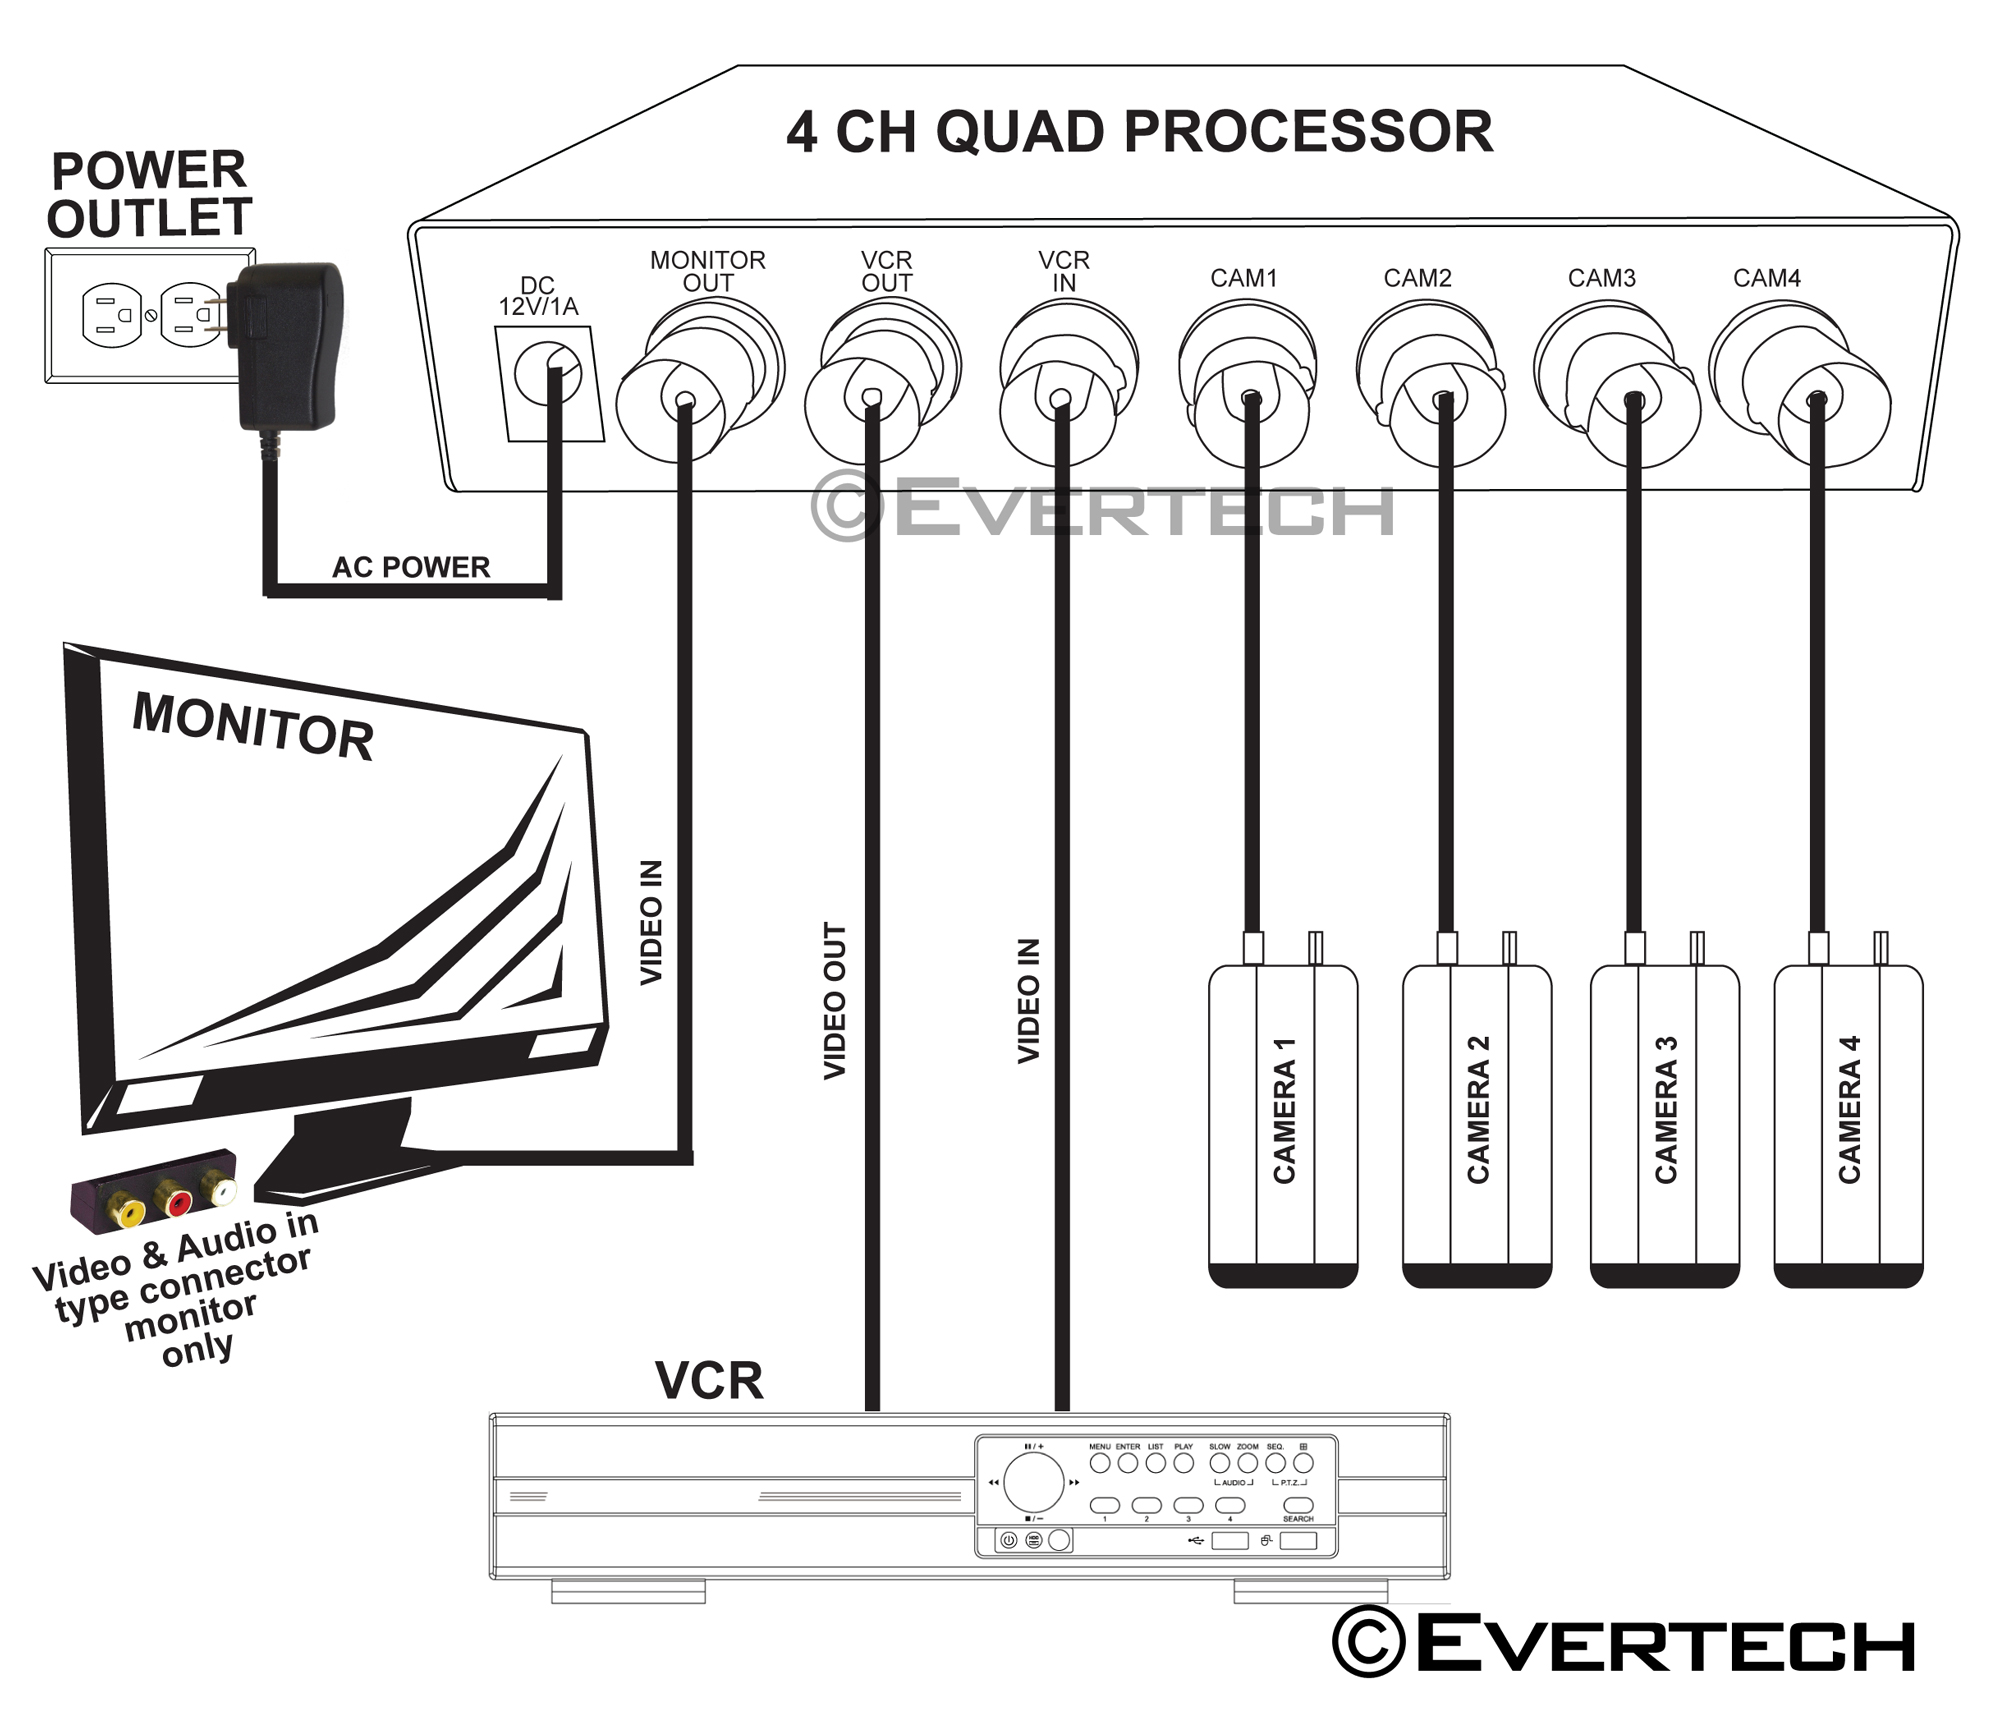 4 Channel 4 CH Quad Processor CCTV Security Camera Video